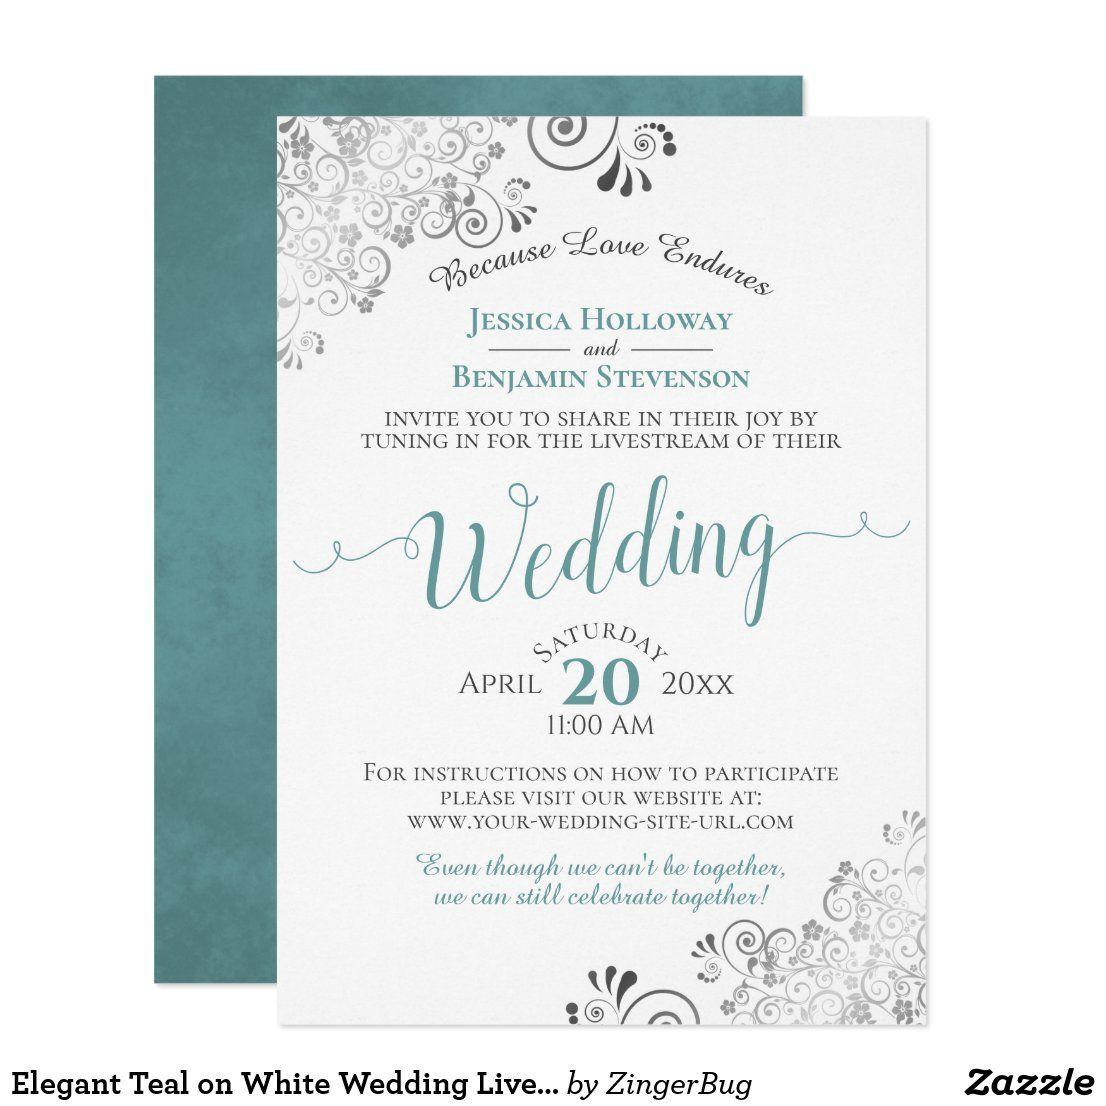 Elegant Teal on White Wedding Livestream Invitation